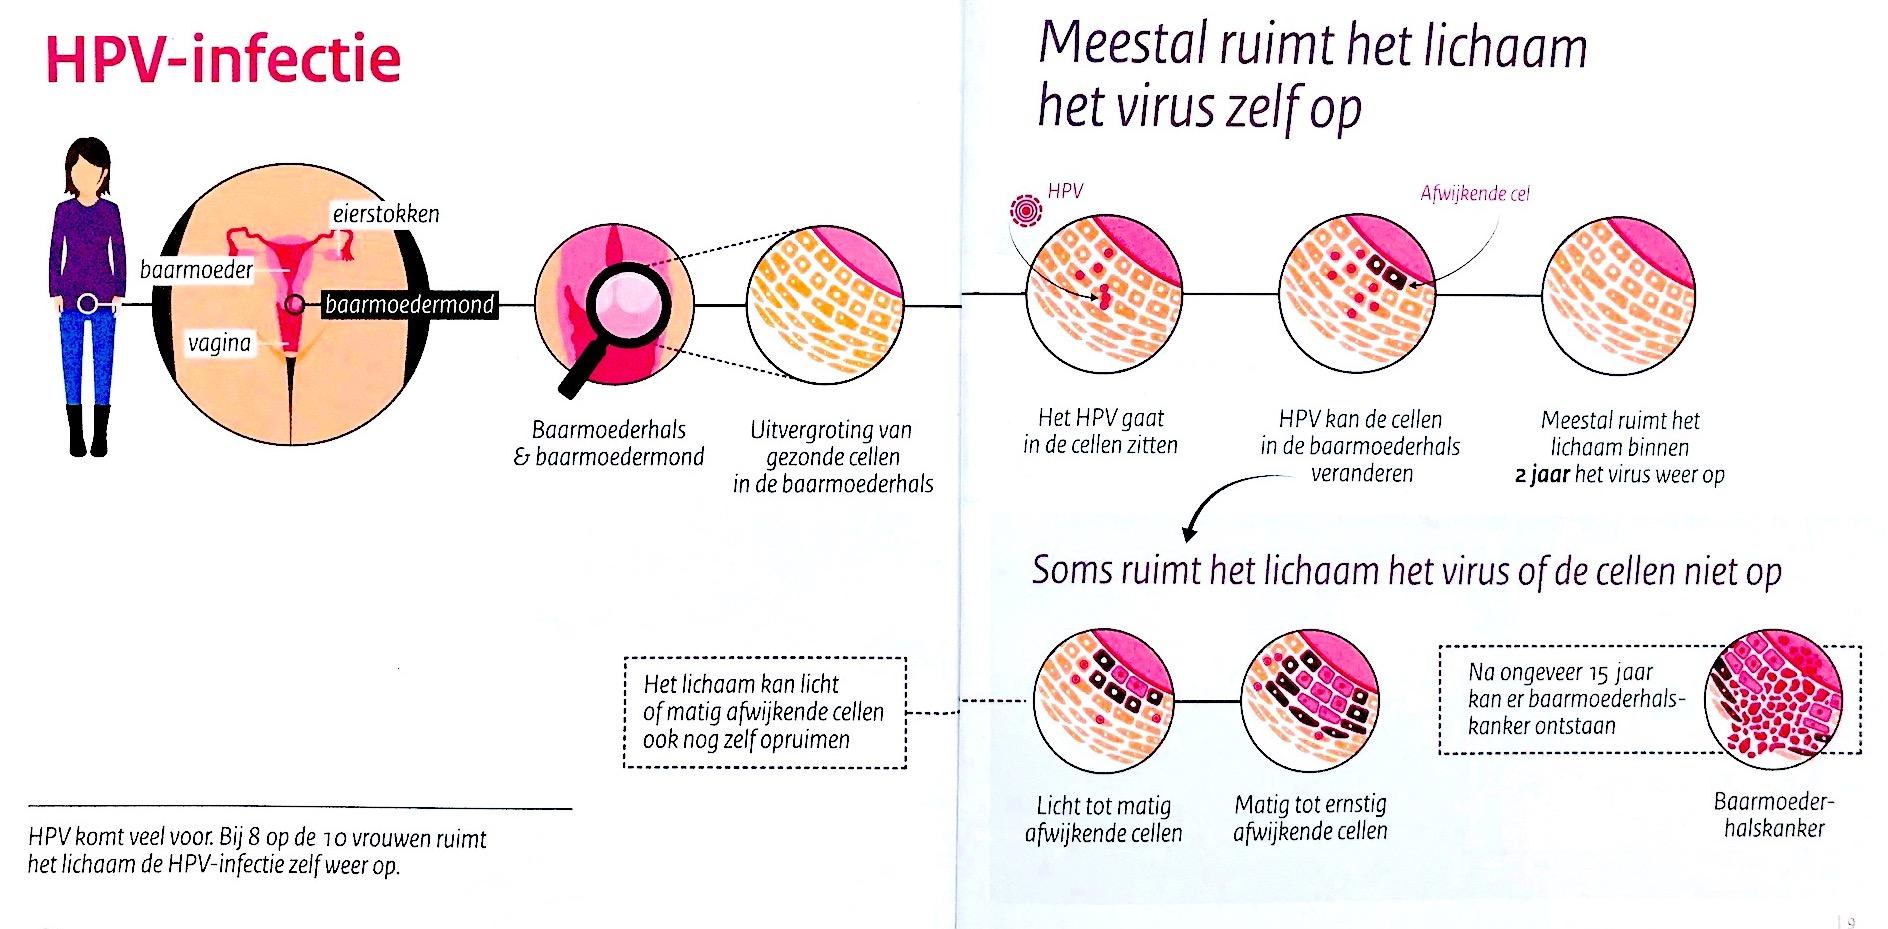 hpv vírus besmettelijk